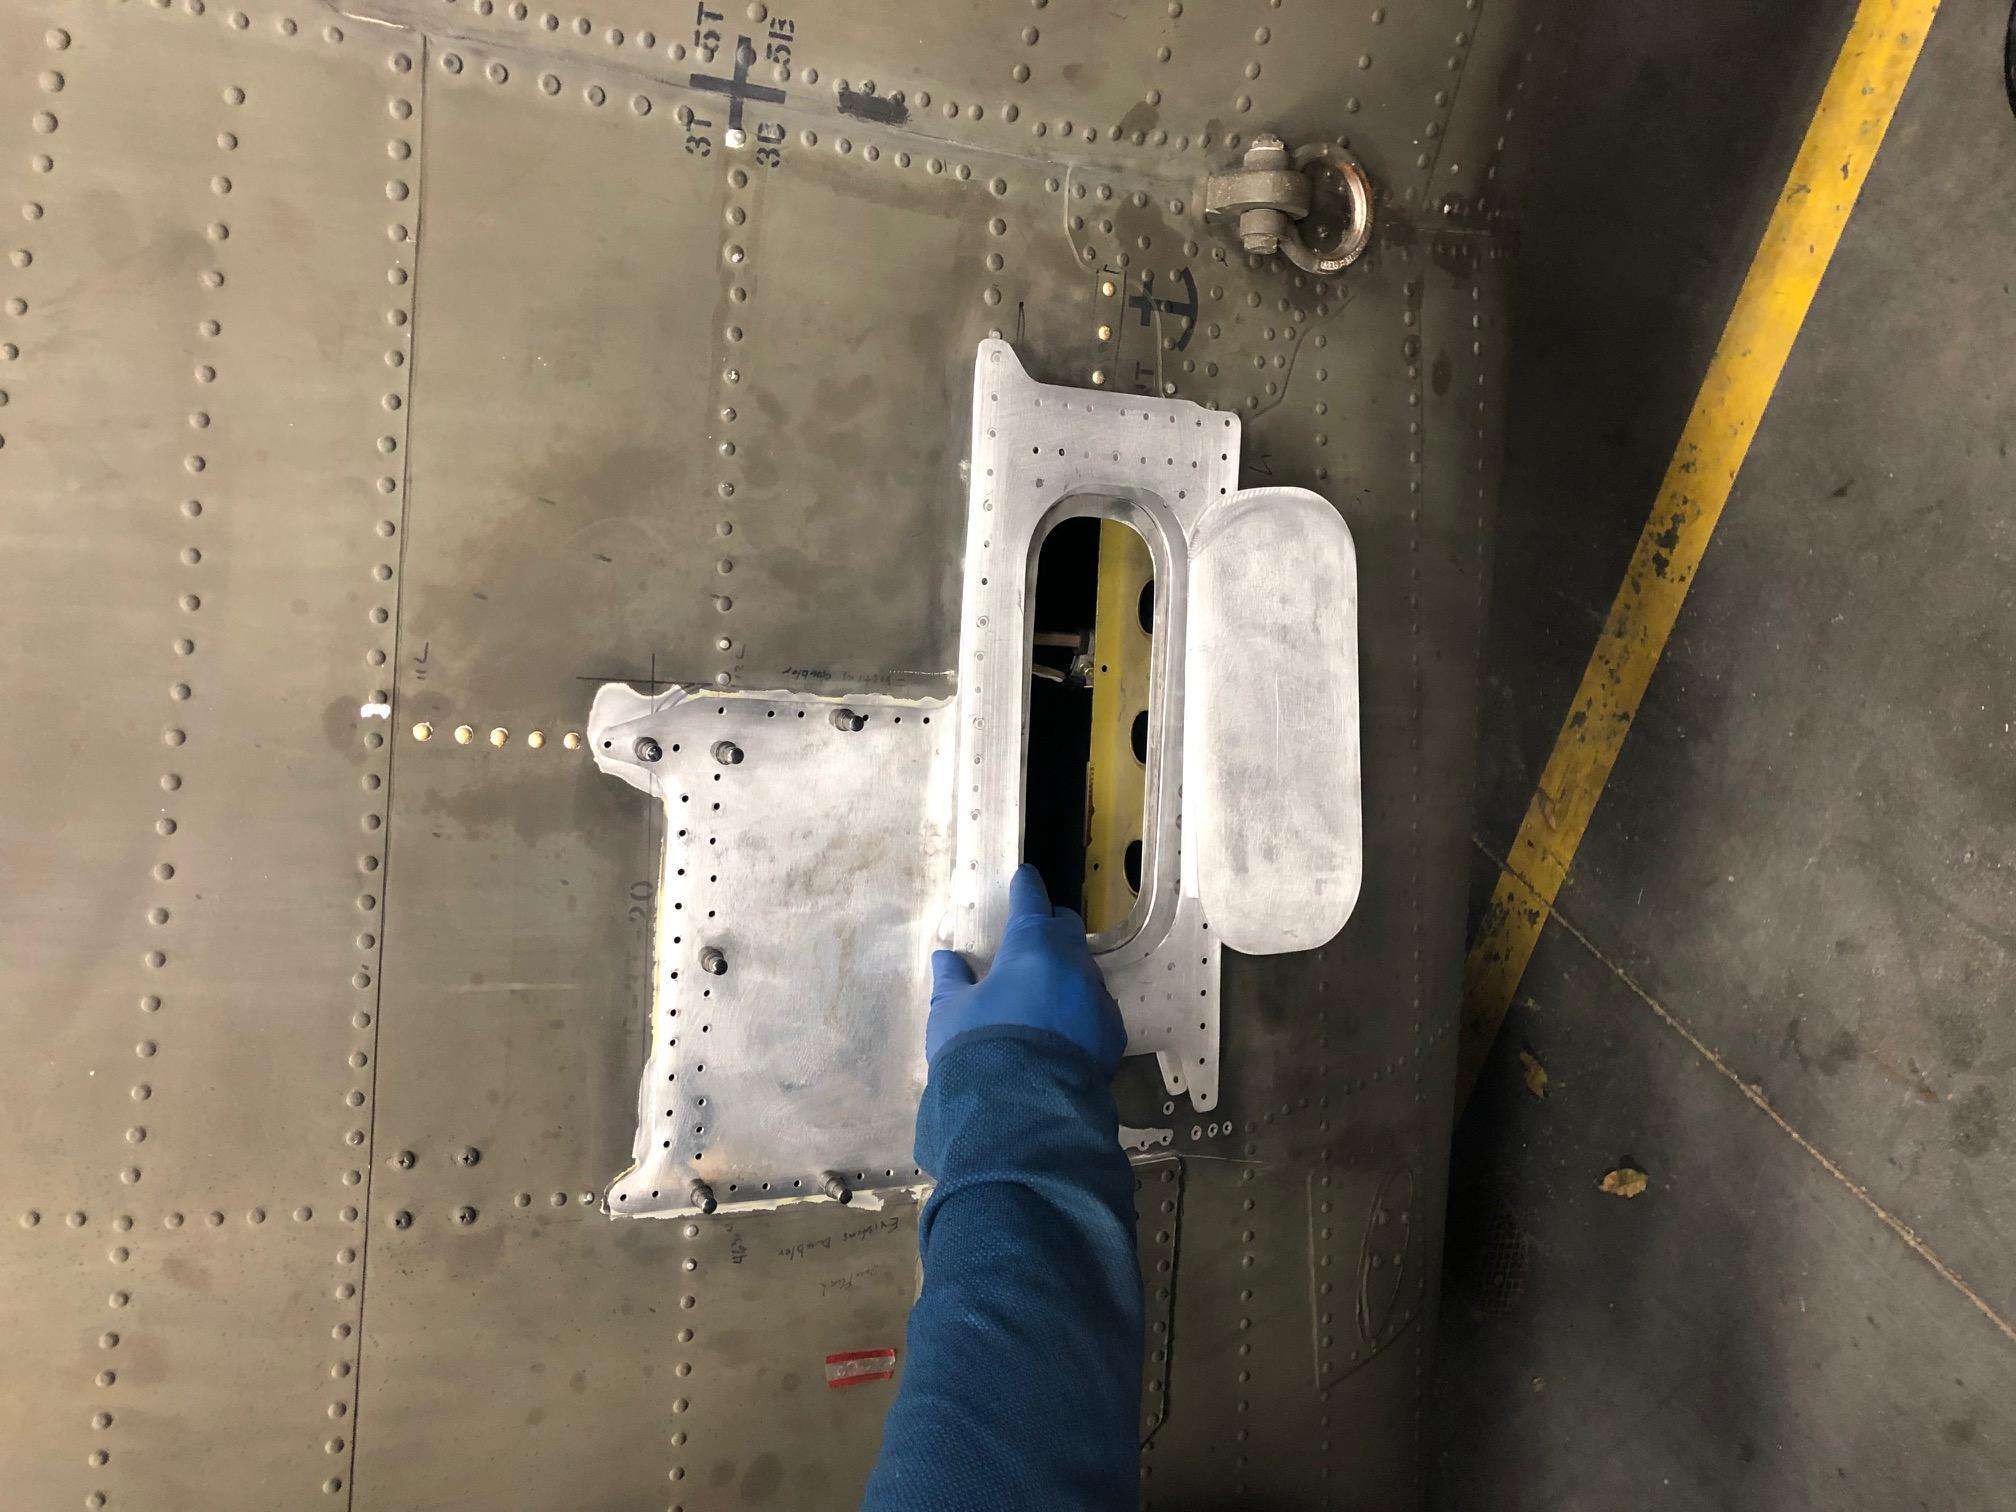 APU Hand pump and gauge relocation